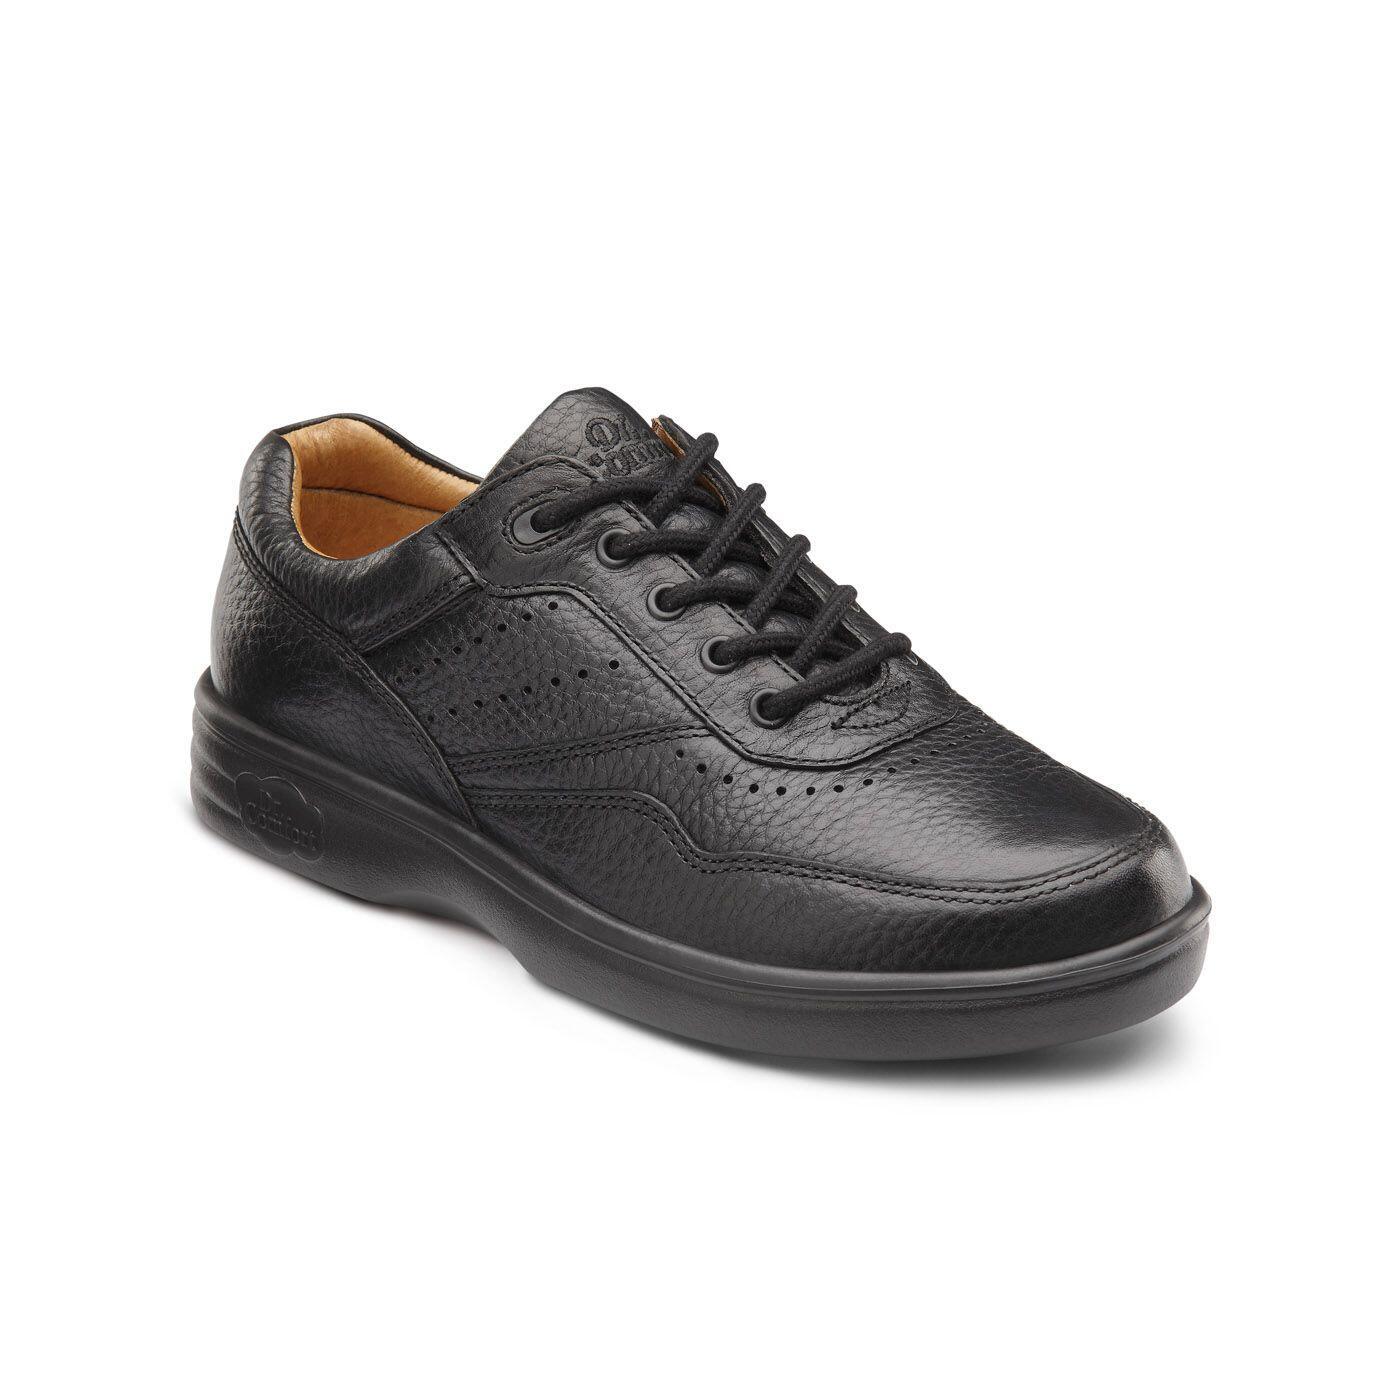 Dr Comfort Patty Women's Shoes